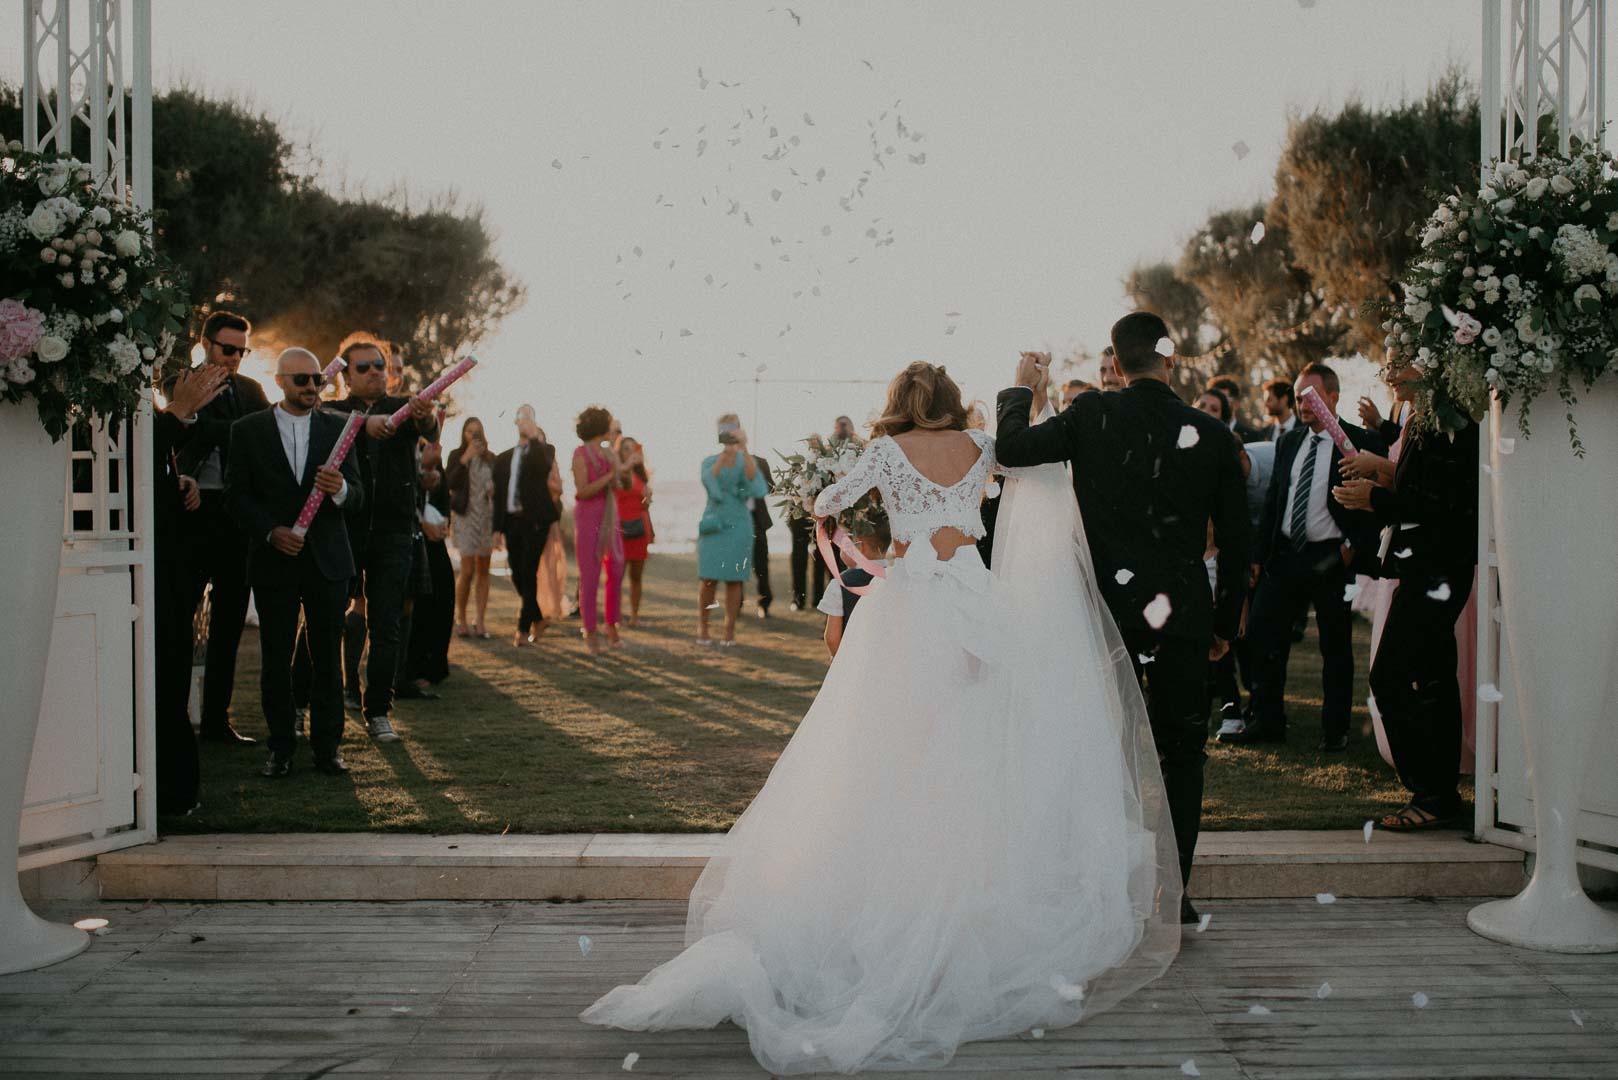 wedding-photographer-destination-fineart-bespoke-reportage-napoli-nabilah-vivianeizzo-spazio46-108